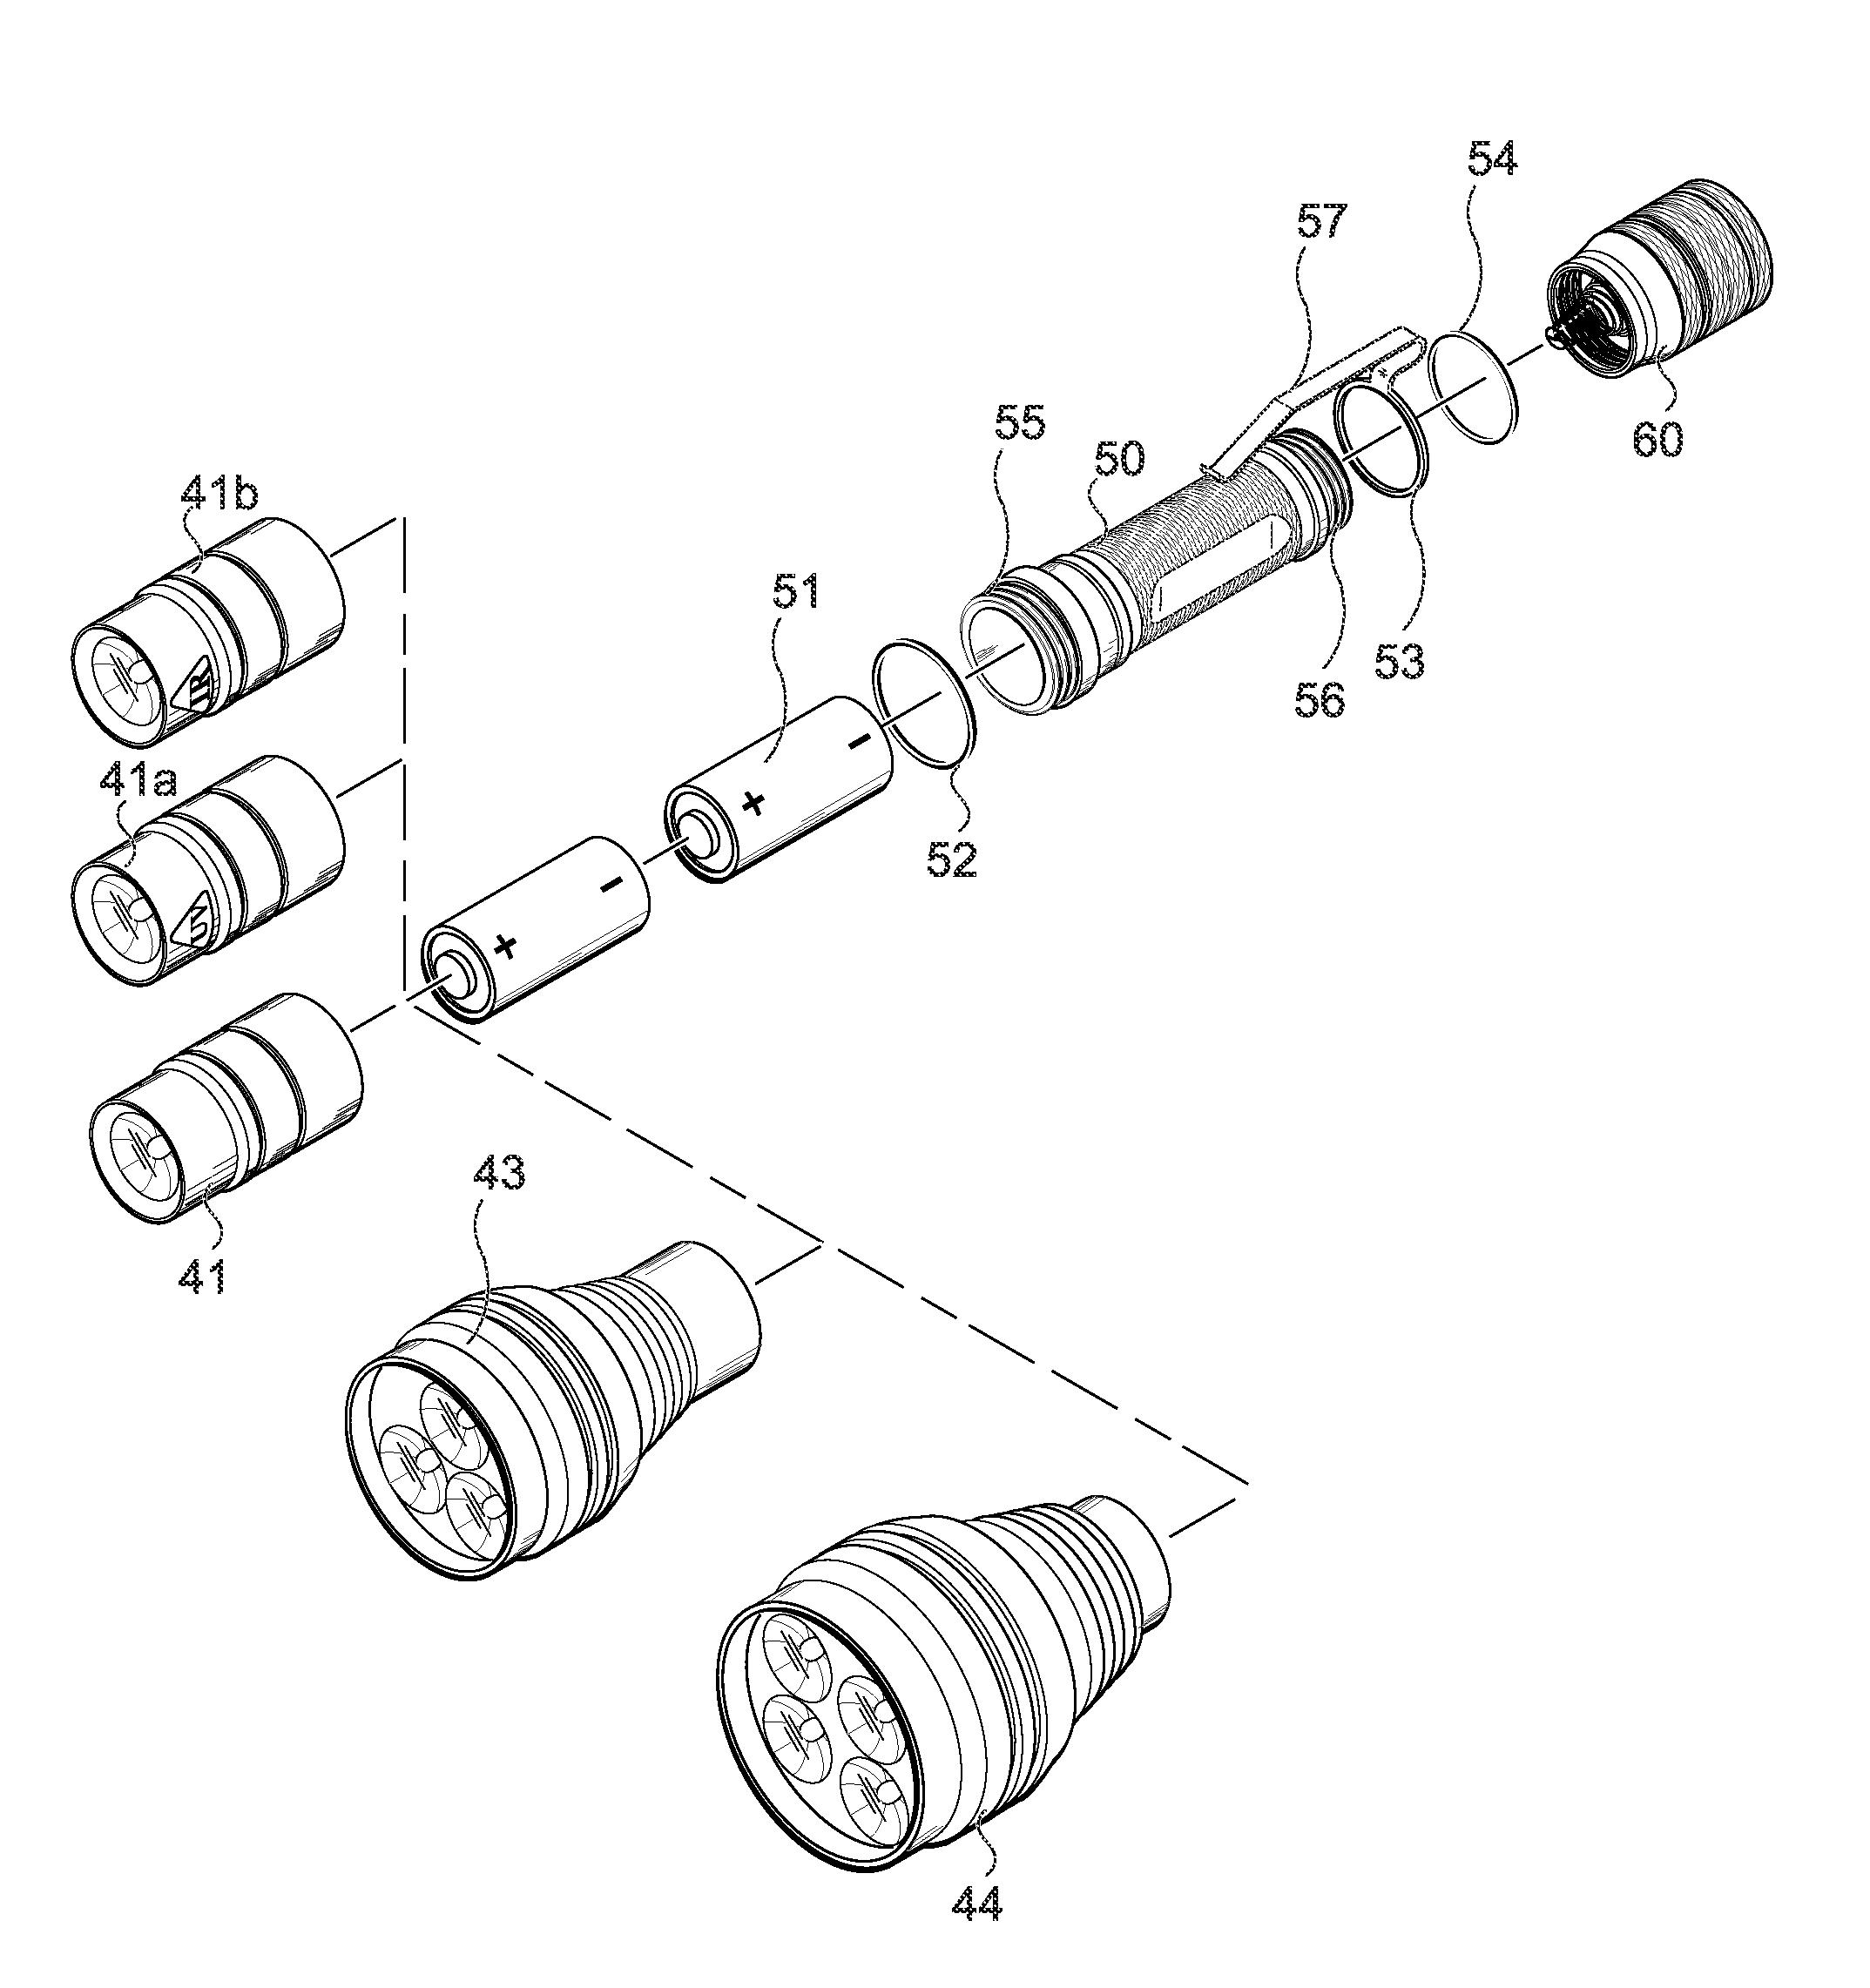 xenon flashlight diagram wiring diagram database Flashlight Schematic us20120020063 smart tactical flashlight and system panasonic flashlight diagram patent drawing